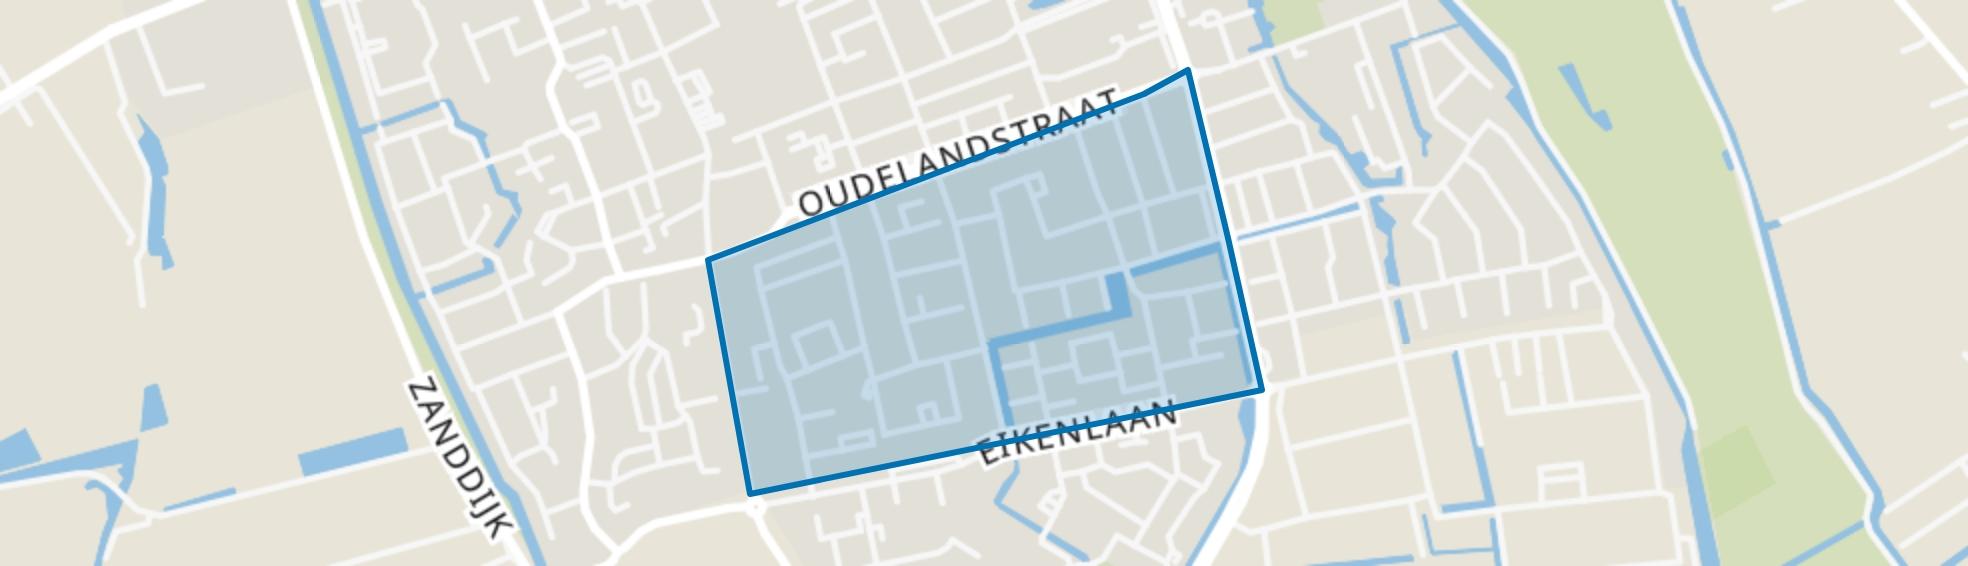 Oudeland, 's-Gravenzande map